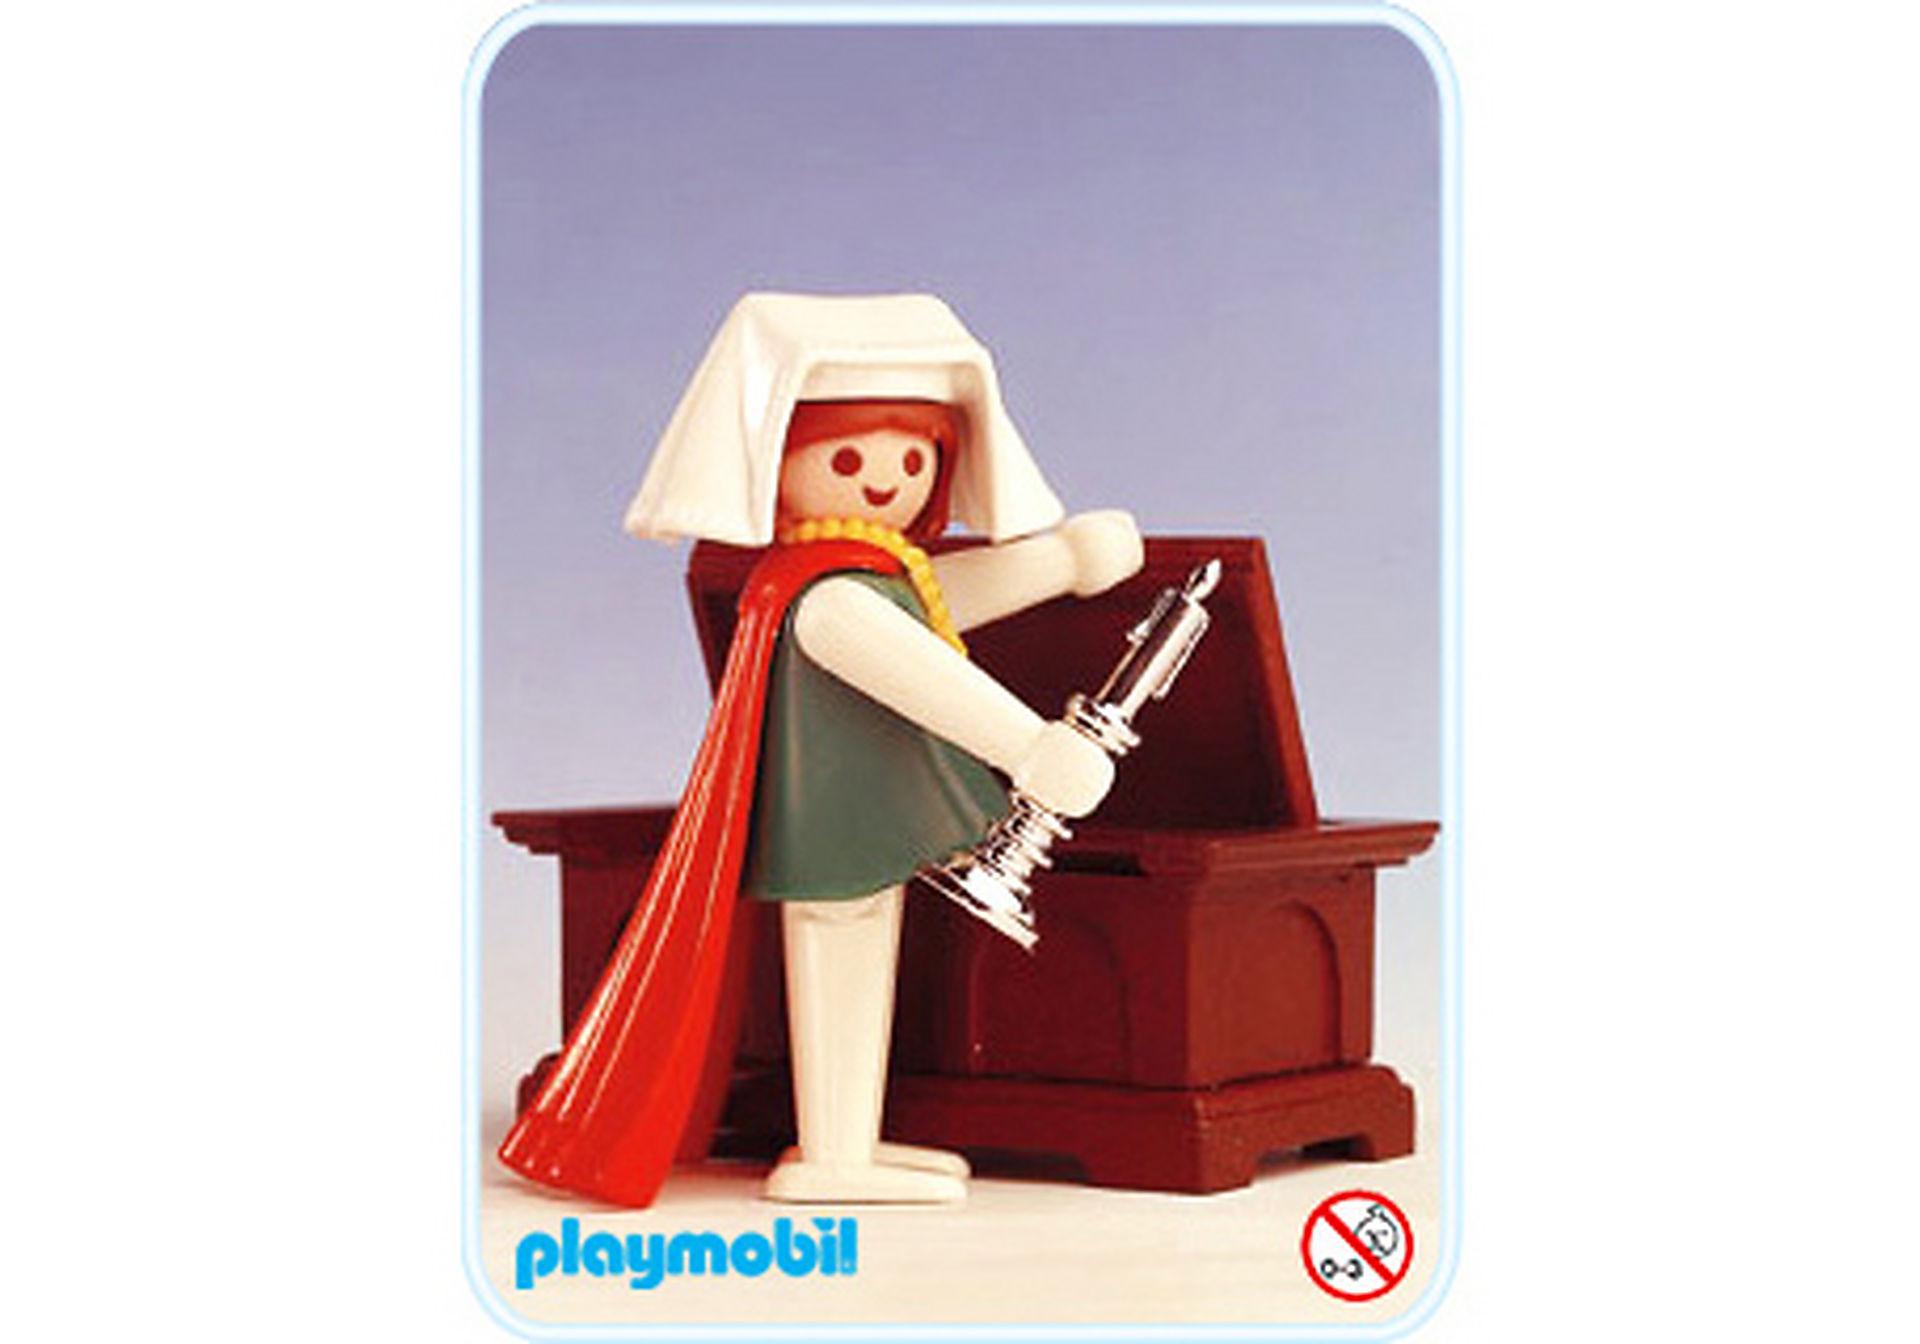 http://media.playmobil.com/i/playmobil/3376-A_product_detail/Bourgeoise / coffre à trésor